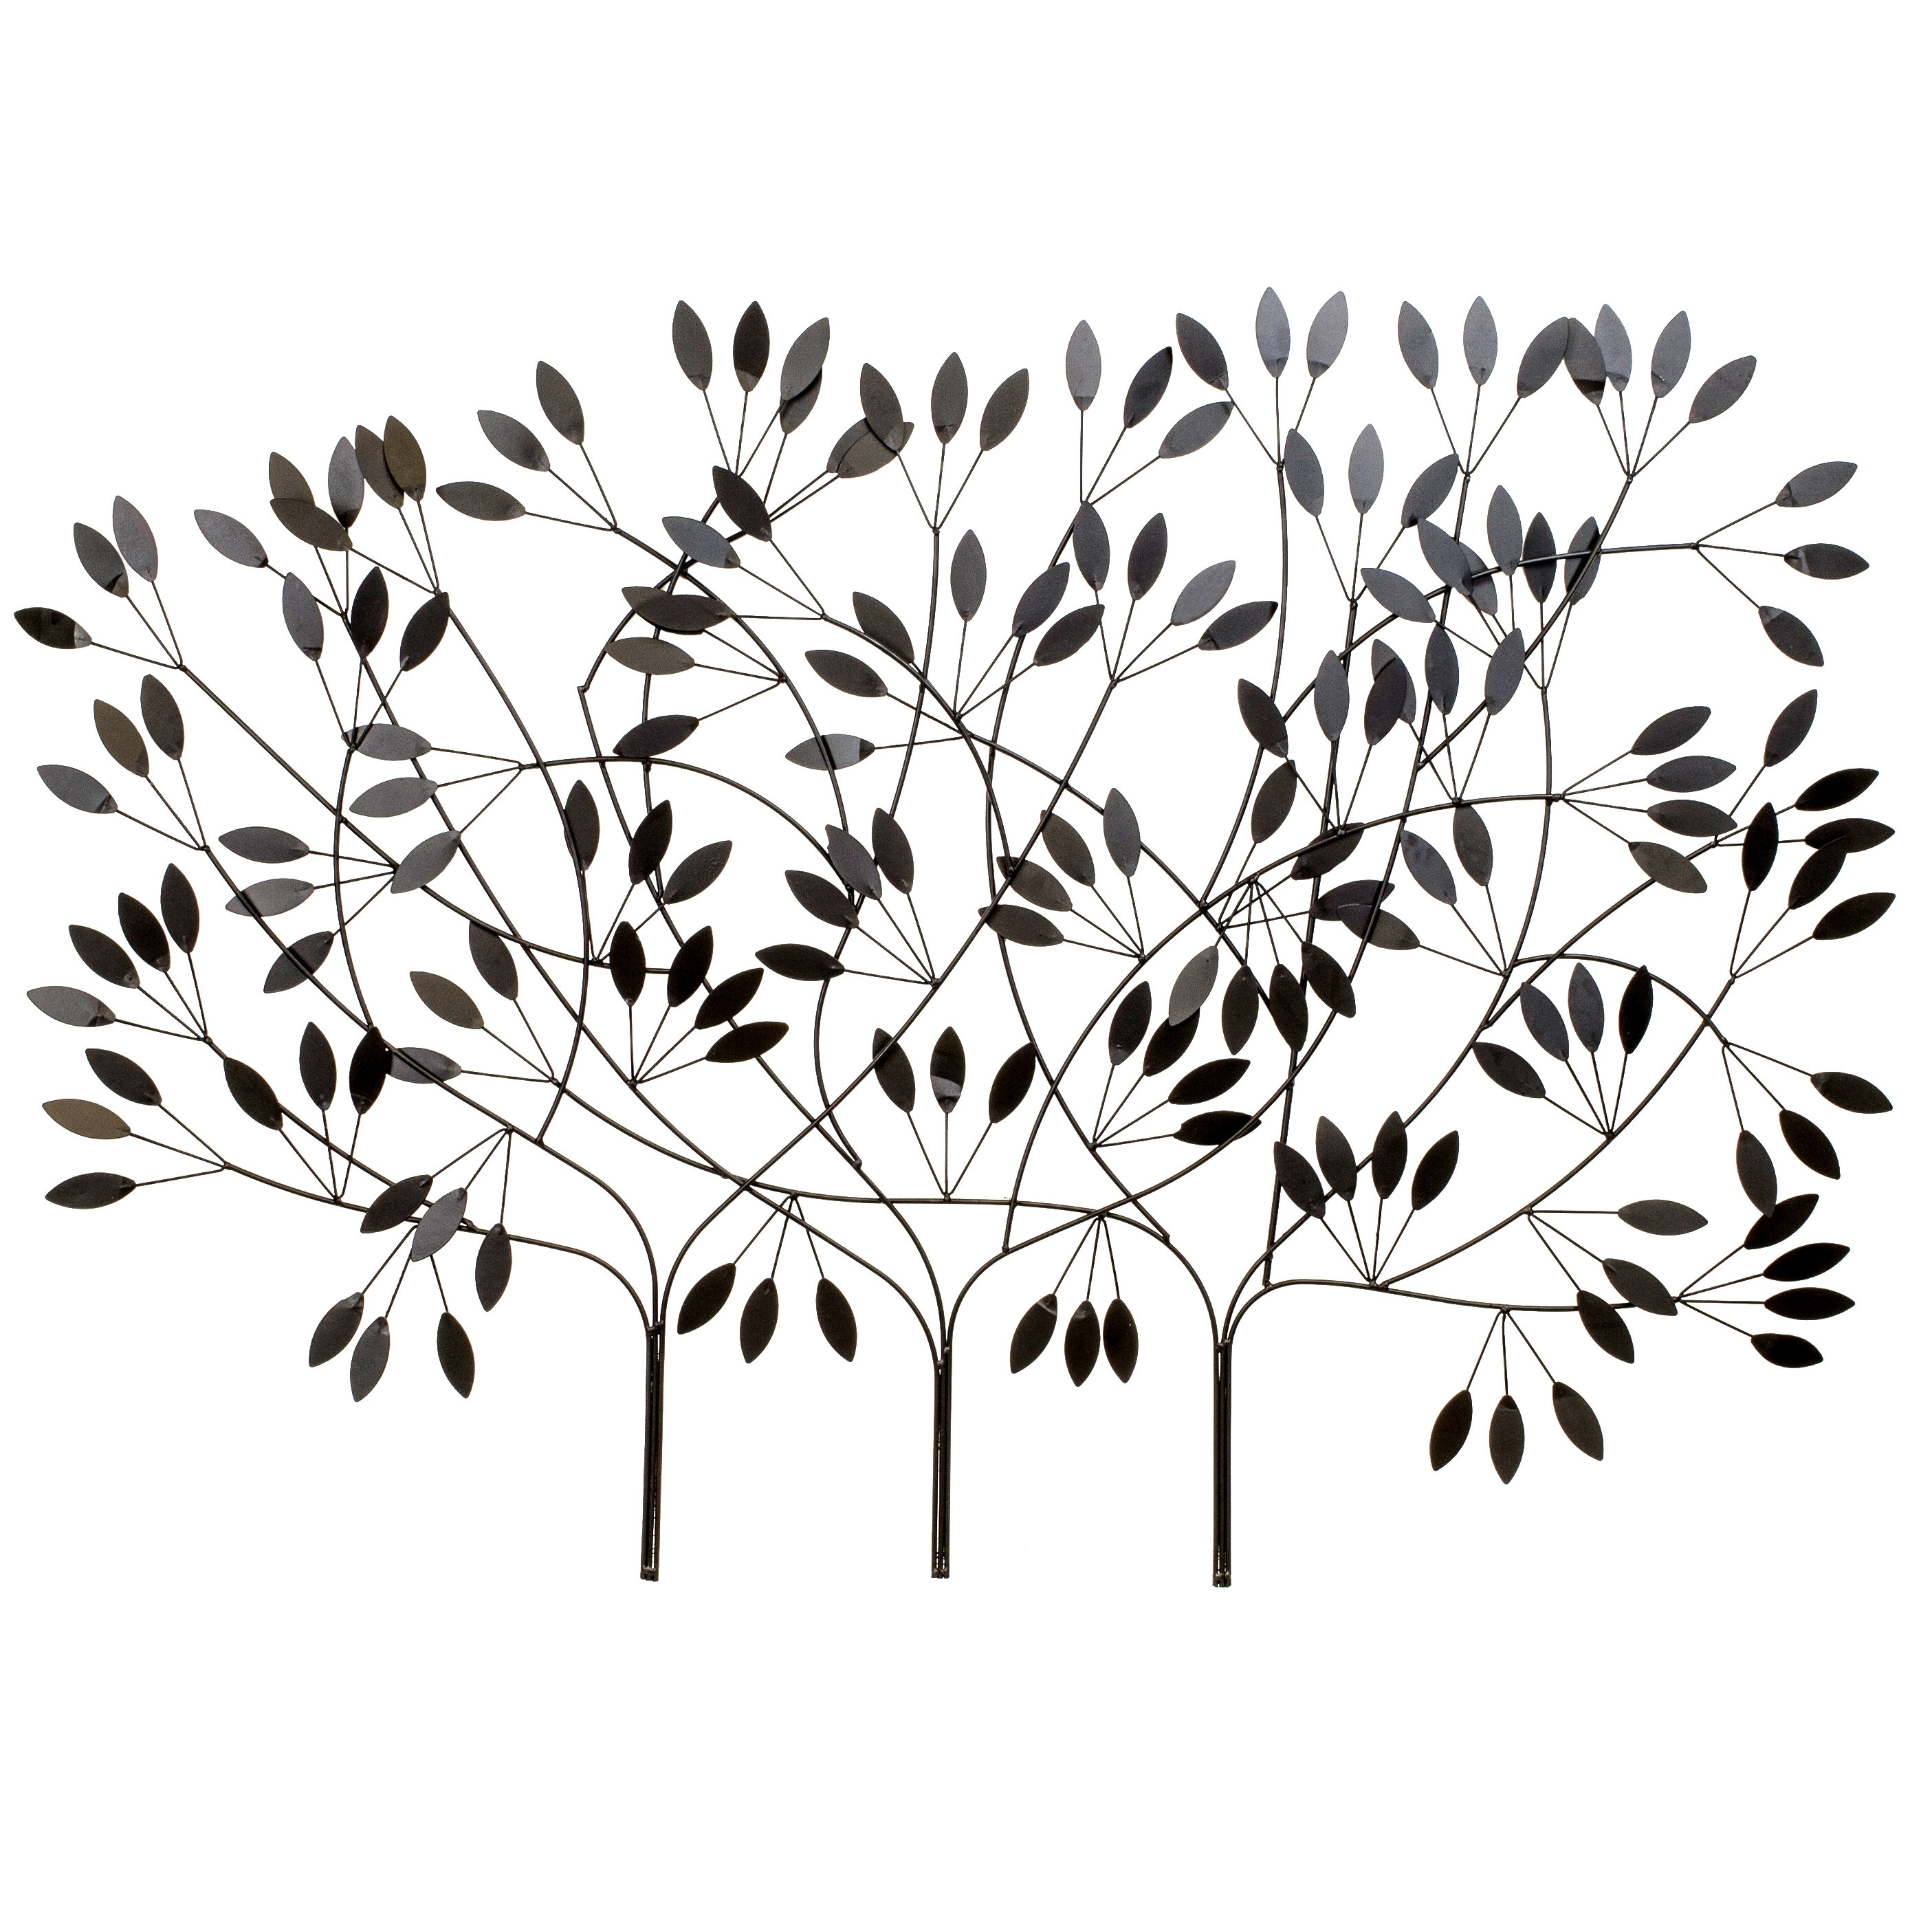 Bayaccents Large Metal Tree Wall Décor | Wayfair for Metal Tree Wall Art (Image 3 of 21)